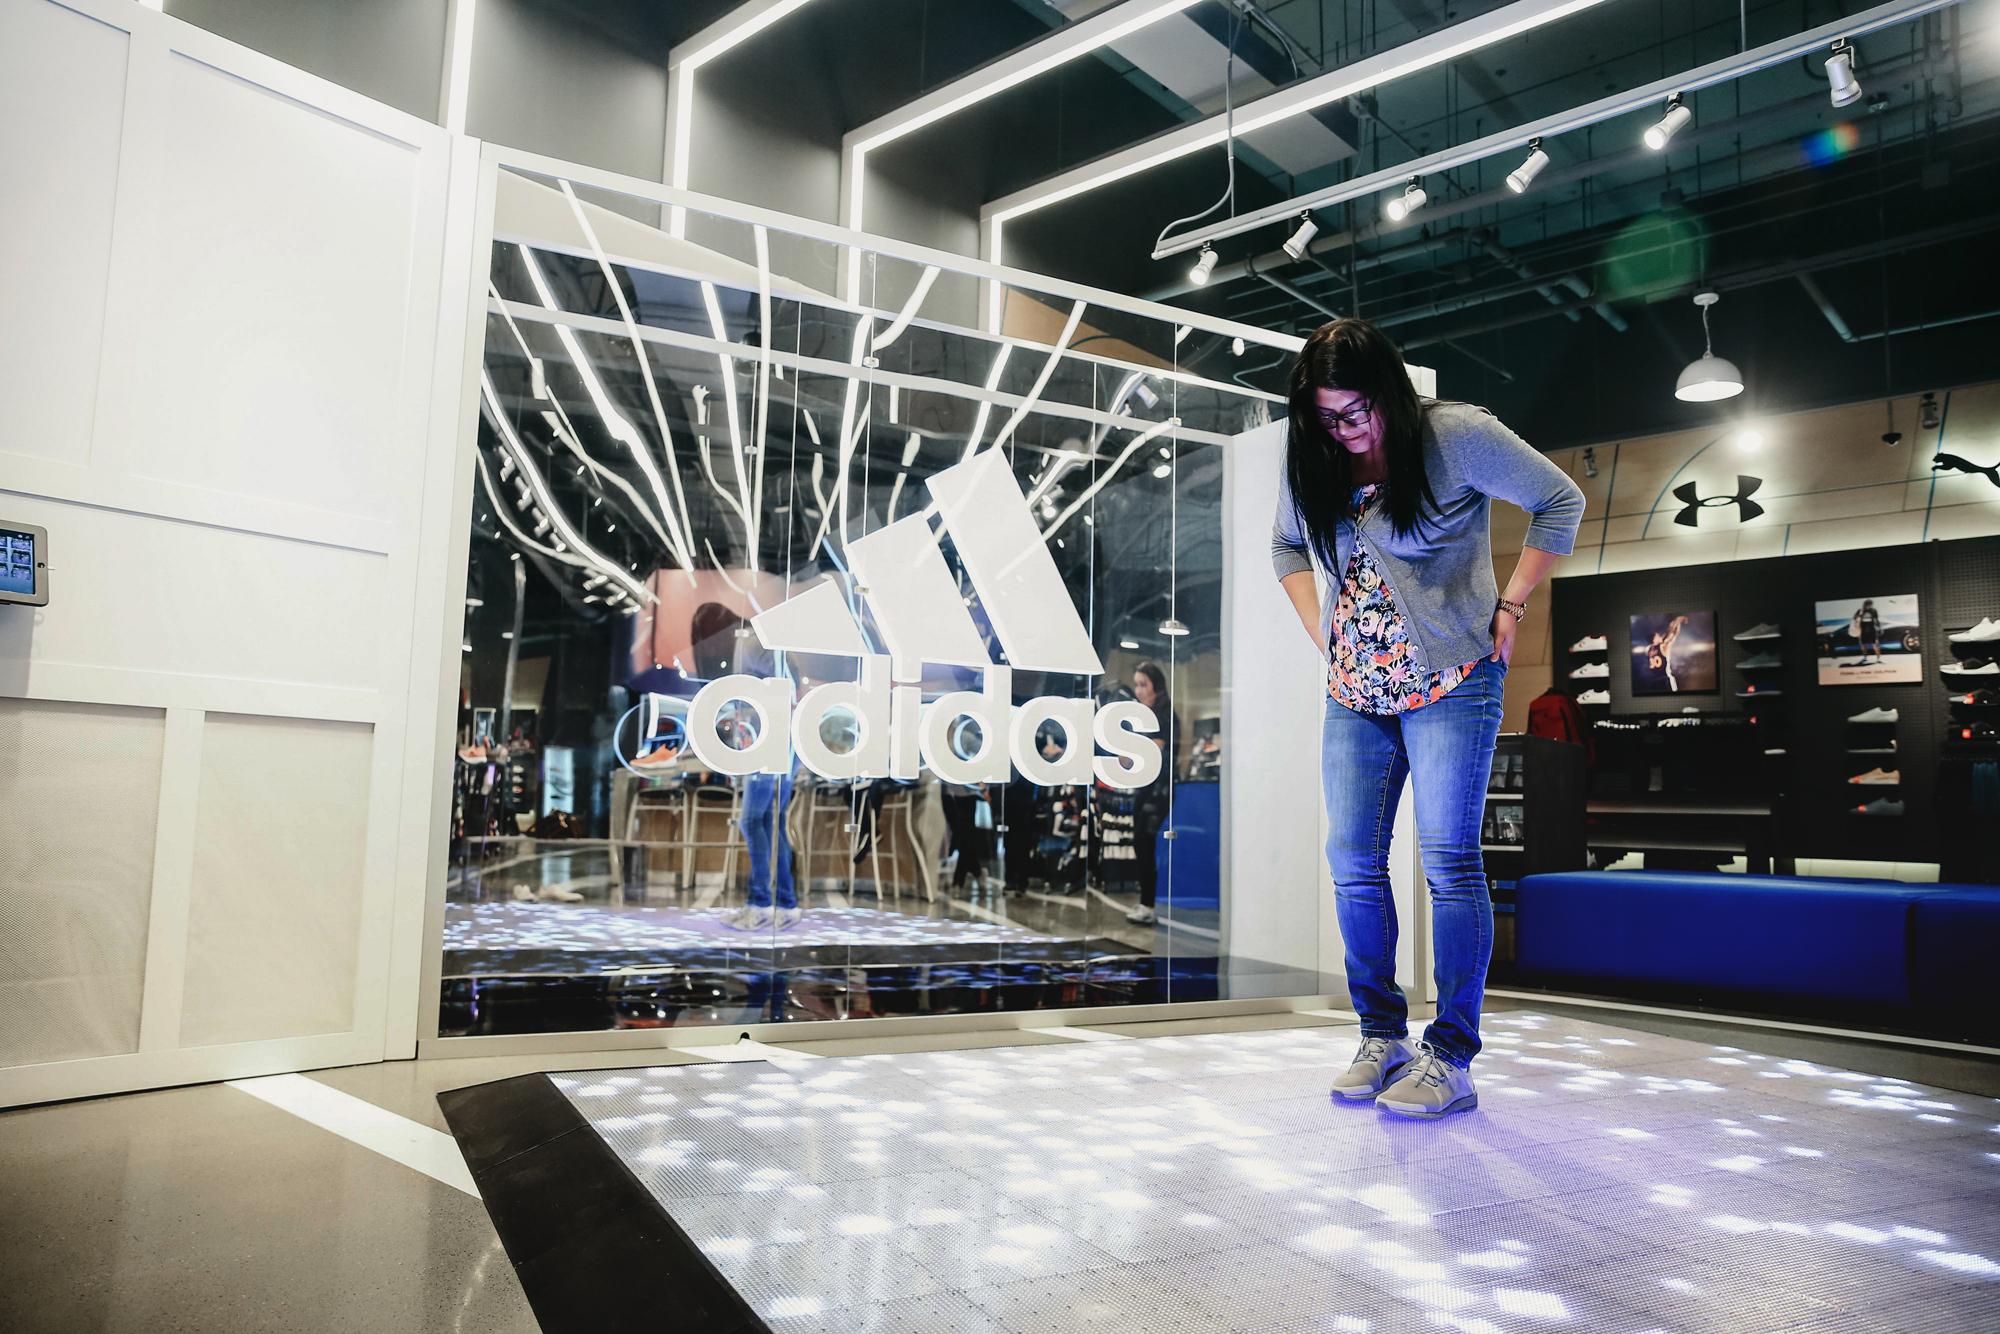 showcase-adidas-people1.jpg